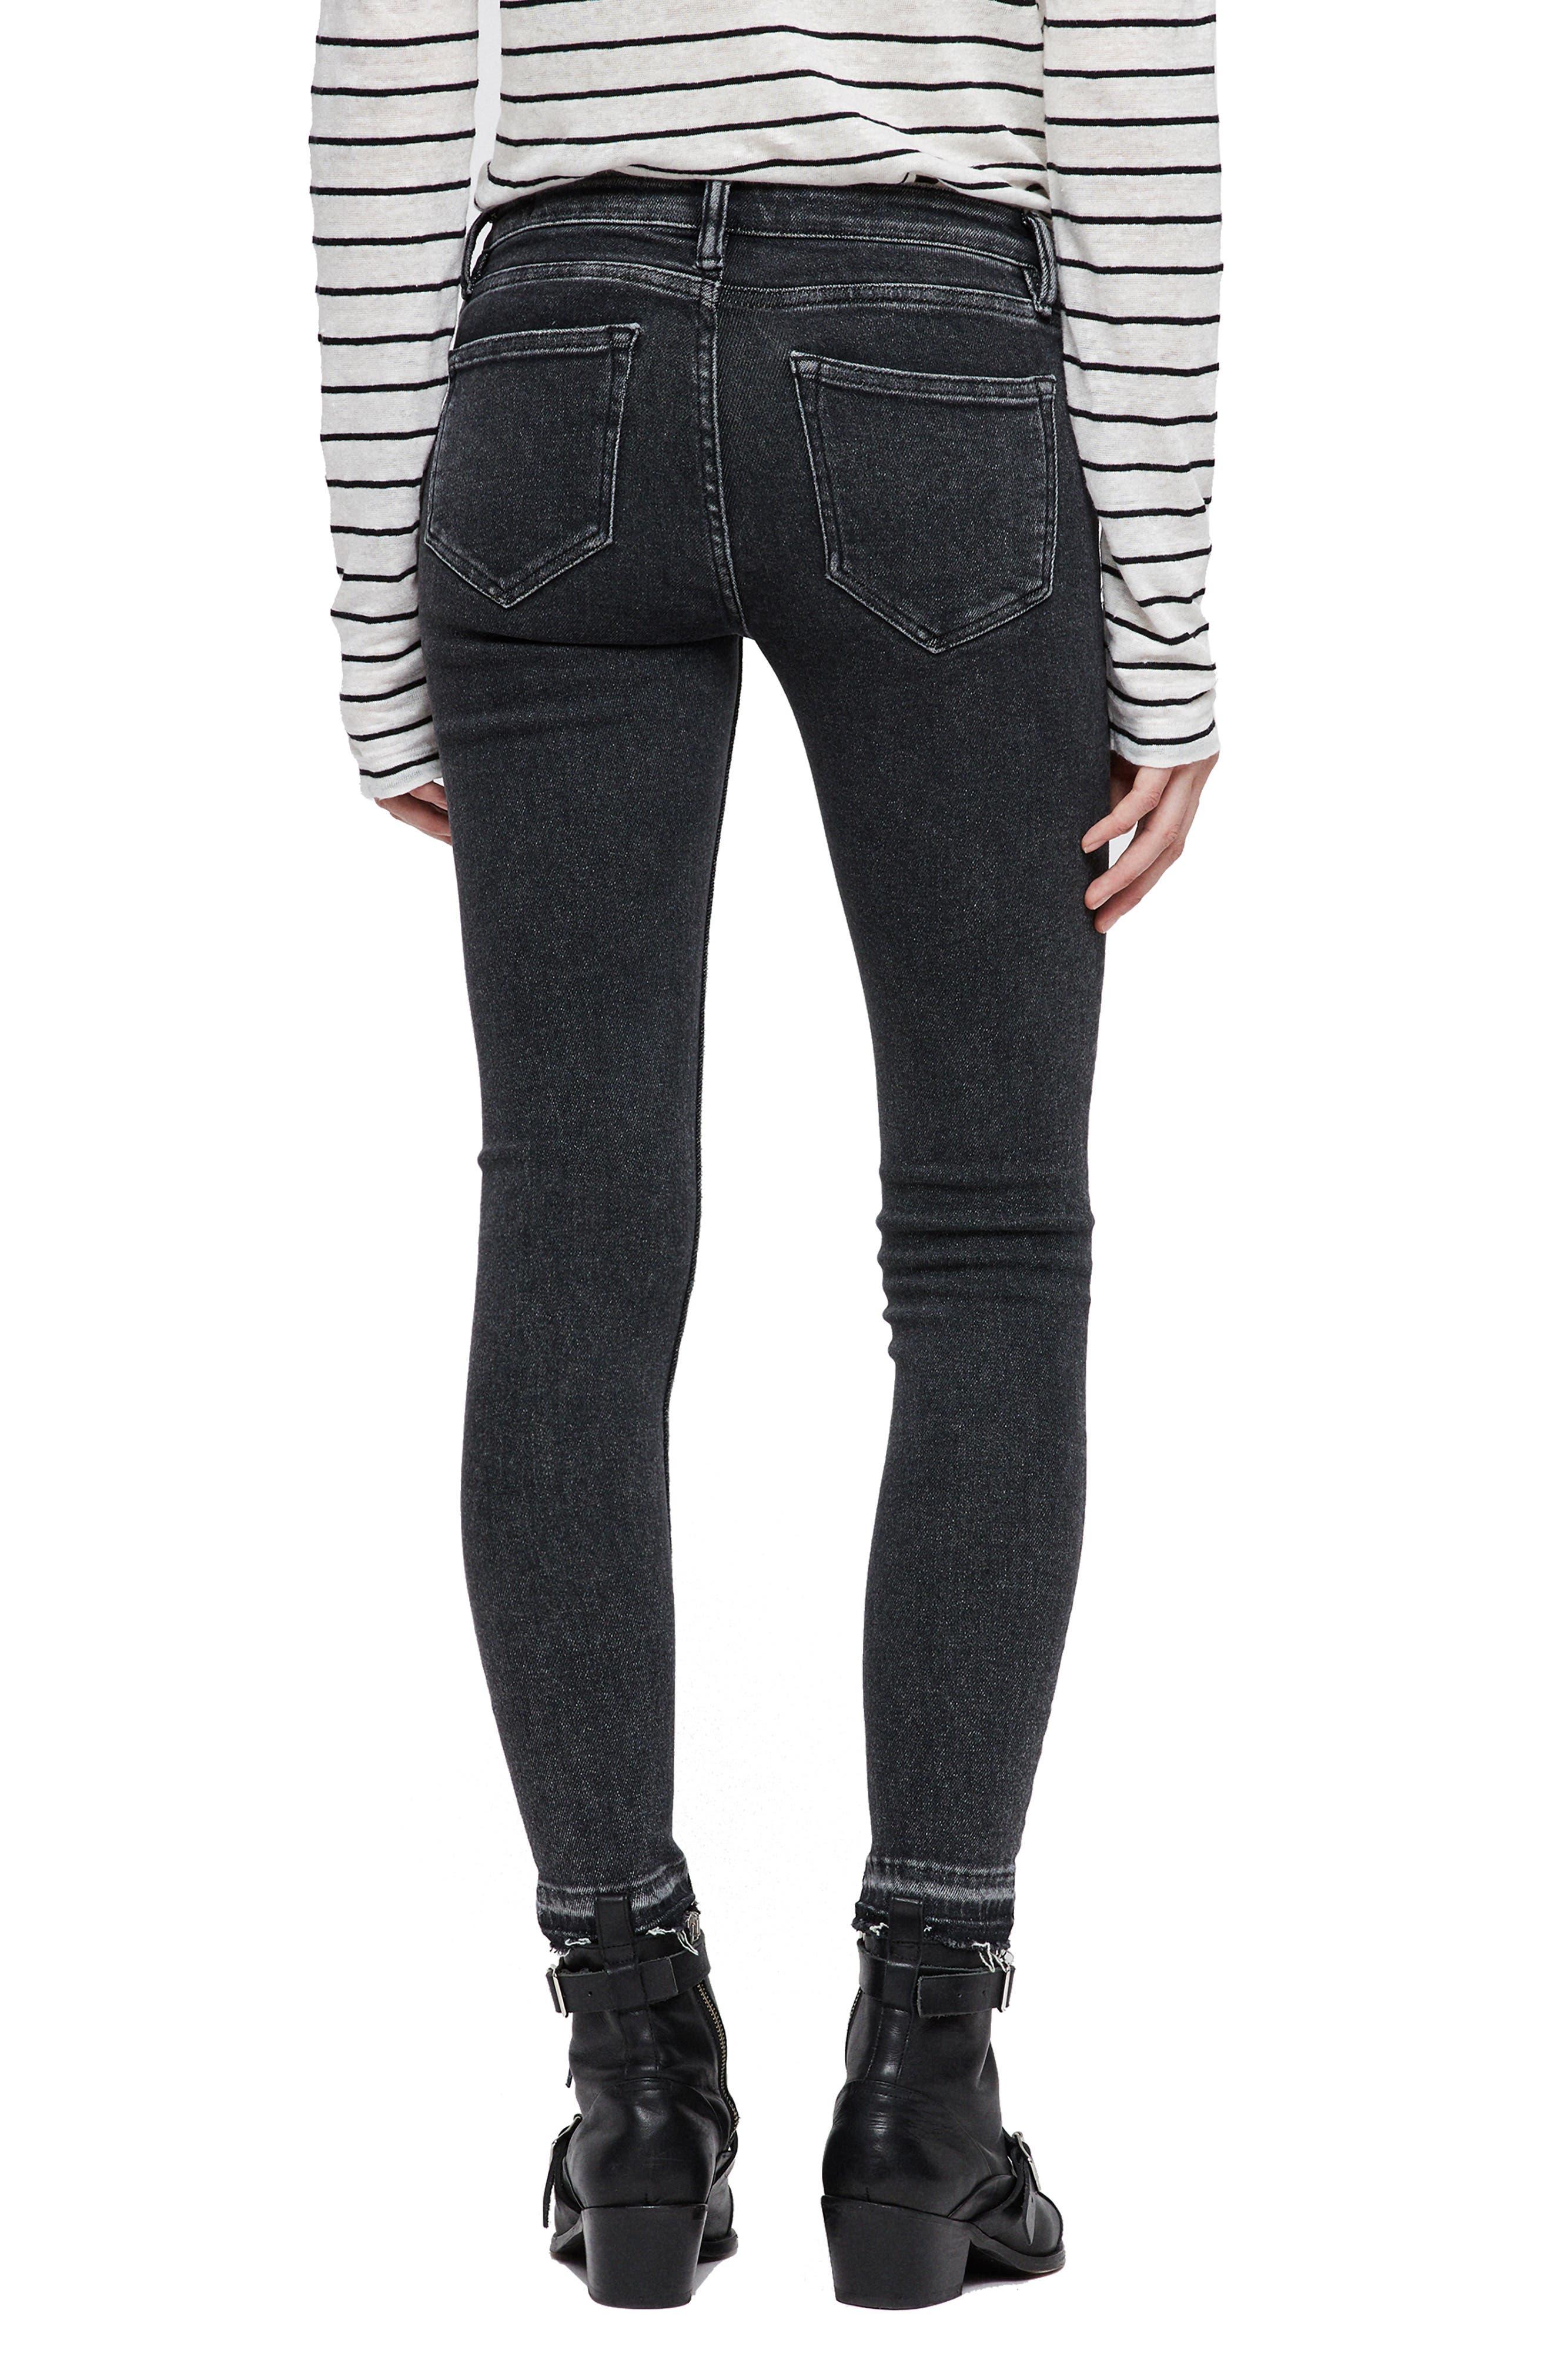 Mast Ankle Skinny Jeans,                             Alternate thumbnail 2, color,                             WASHED BLACK